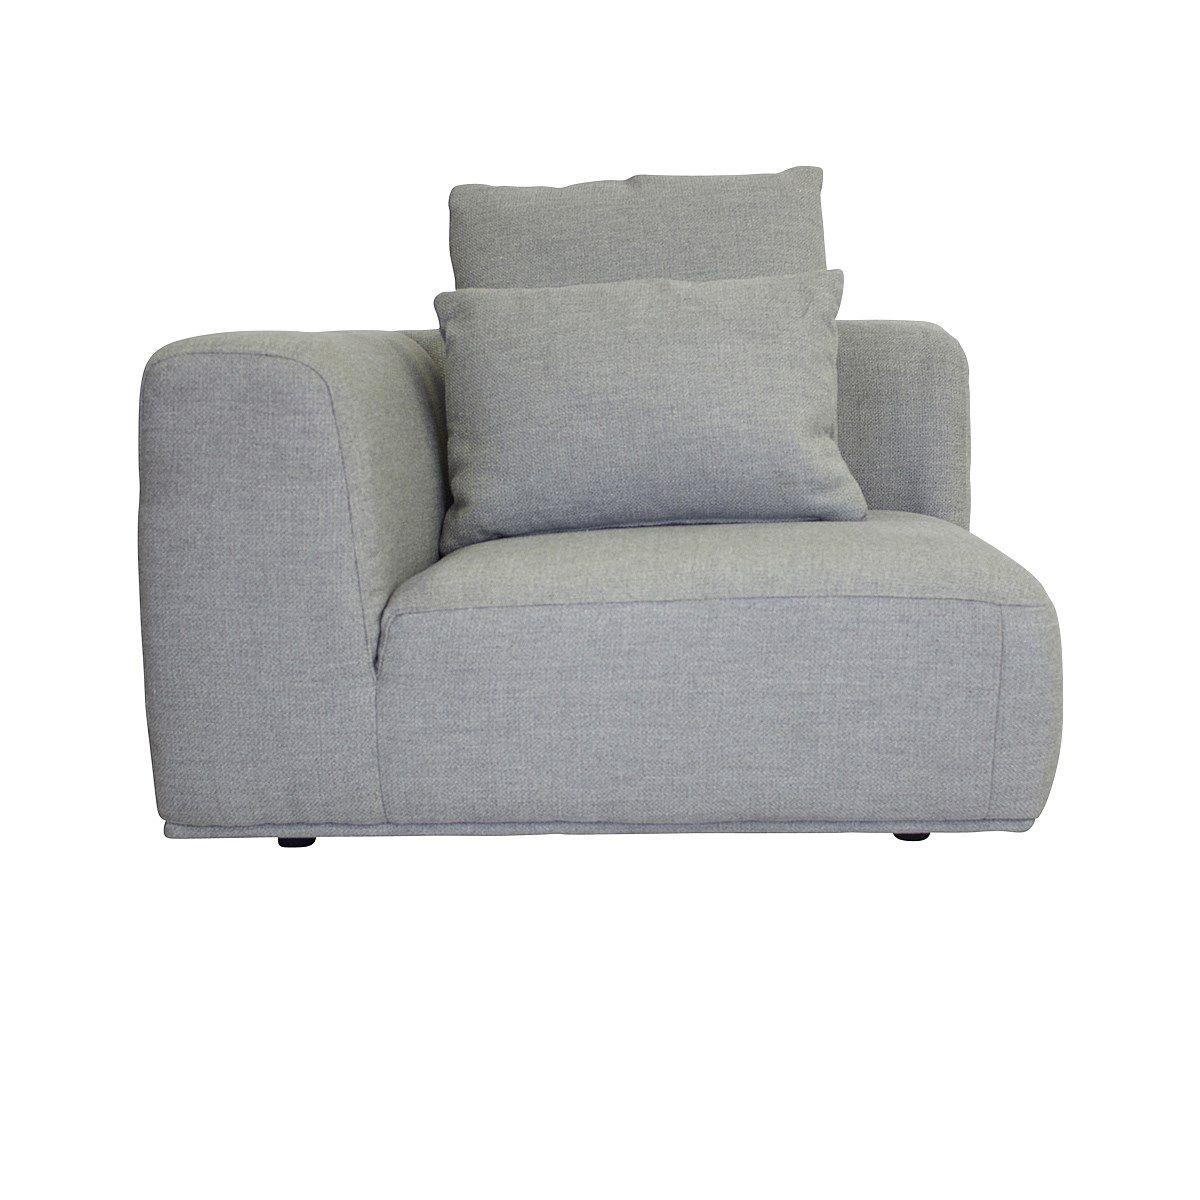 Wondrous Living Nood Furniture Home Decor Homewares Sabine Pdpeps Interior Chair Design Pdpepsorg